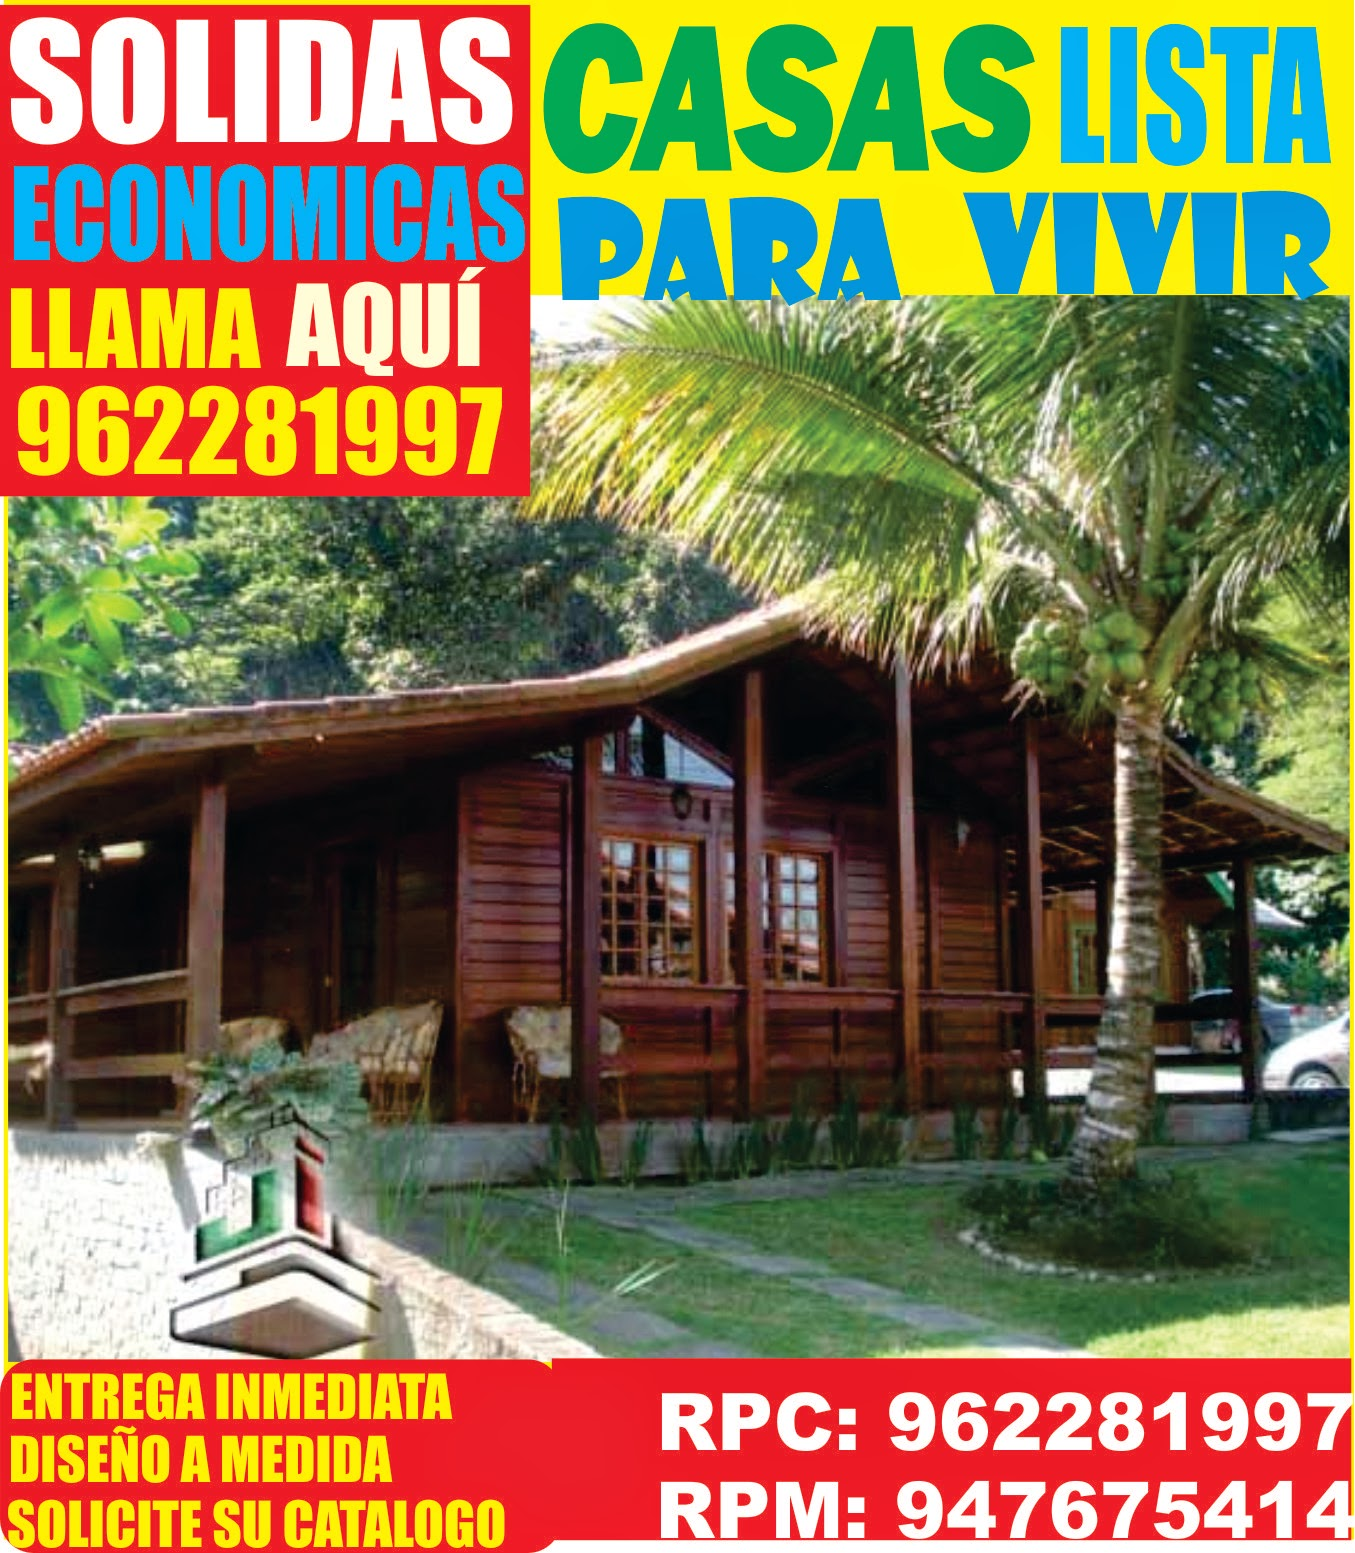 Casas prefabricadas de madera modelos dise o moderno peru - Casas prefabricadas de diseno moderno ...